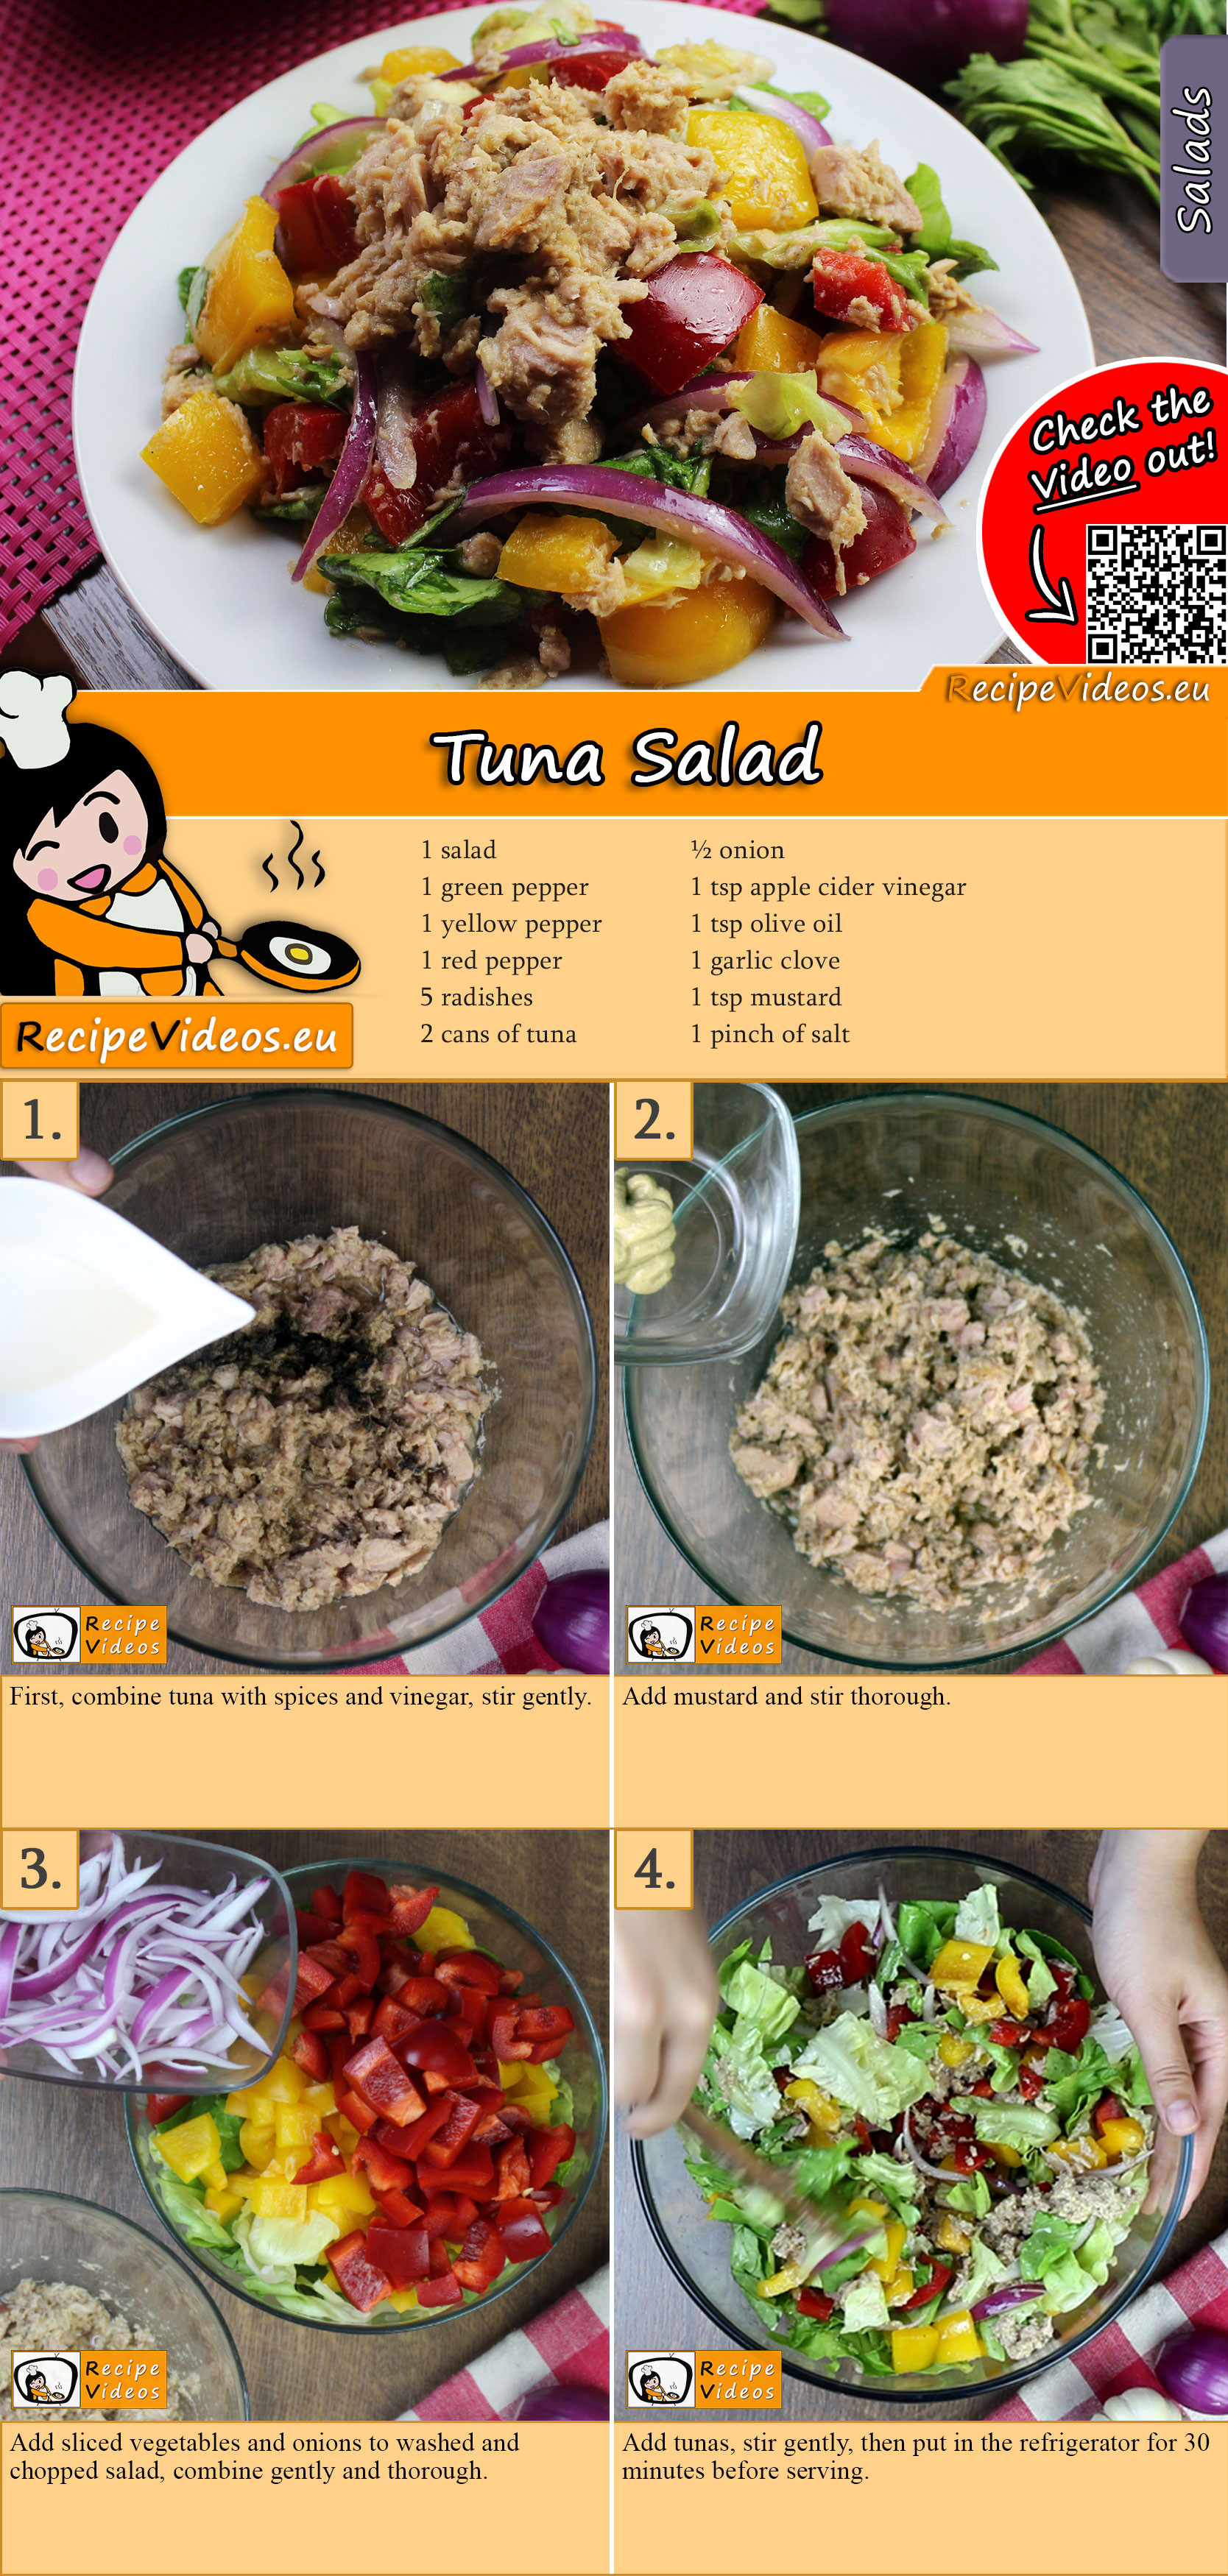 Tuna Salad recipe with video